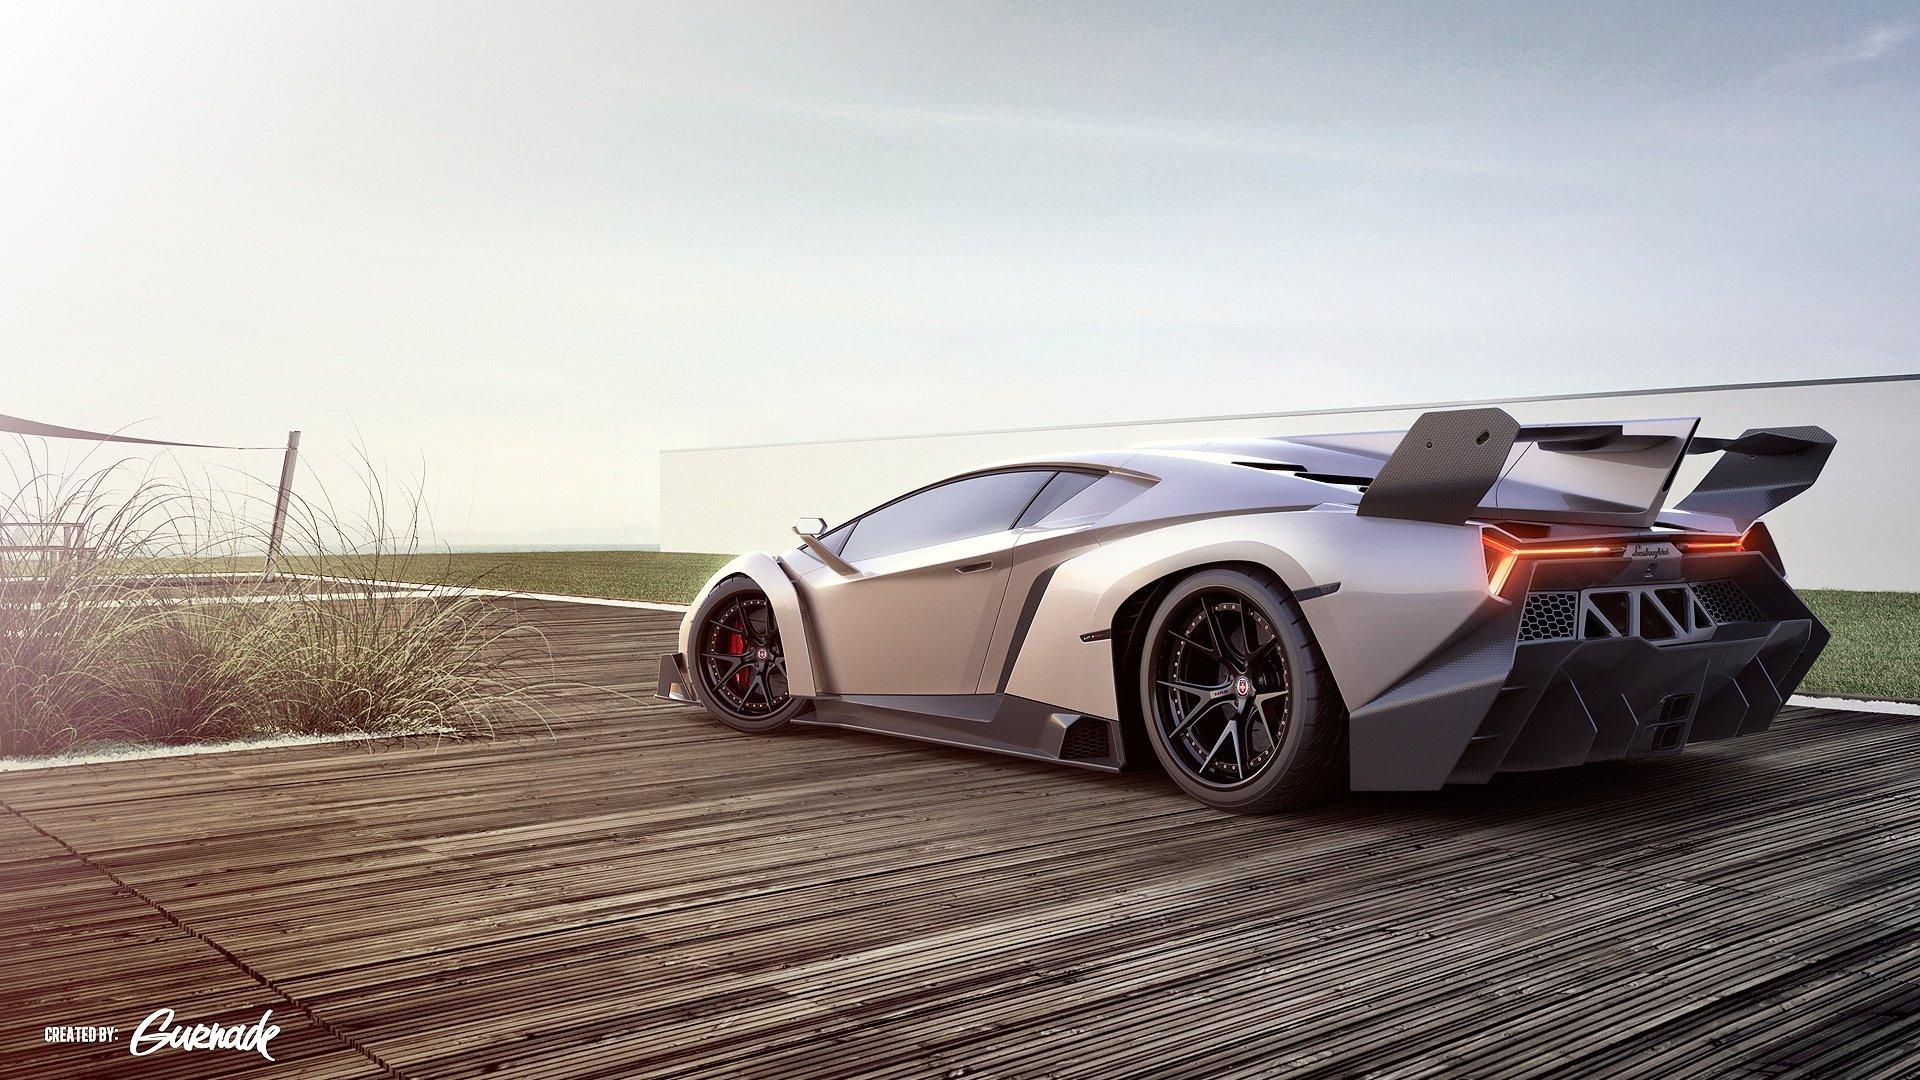 Lamborghini Veneno Sports Car Wallpapers   HD Wallpapers